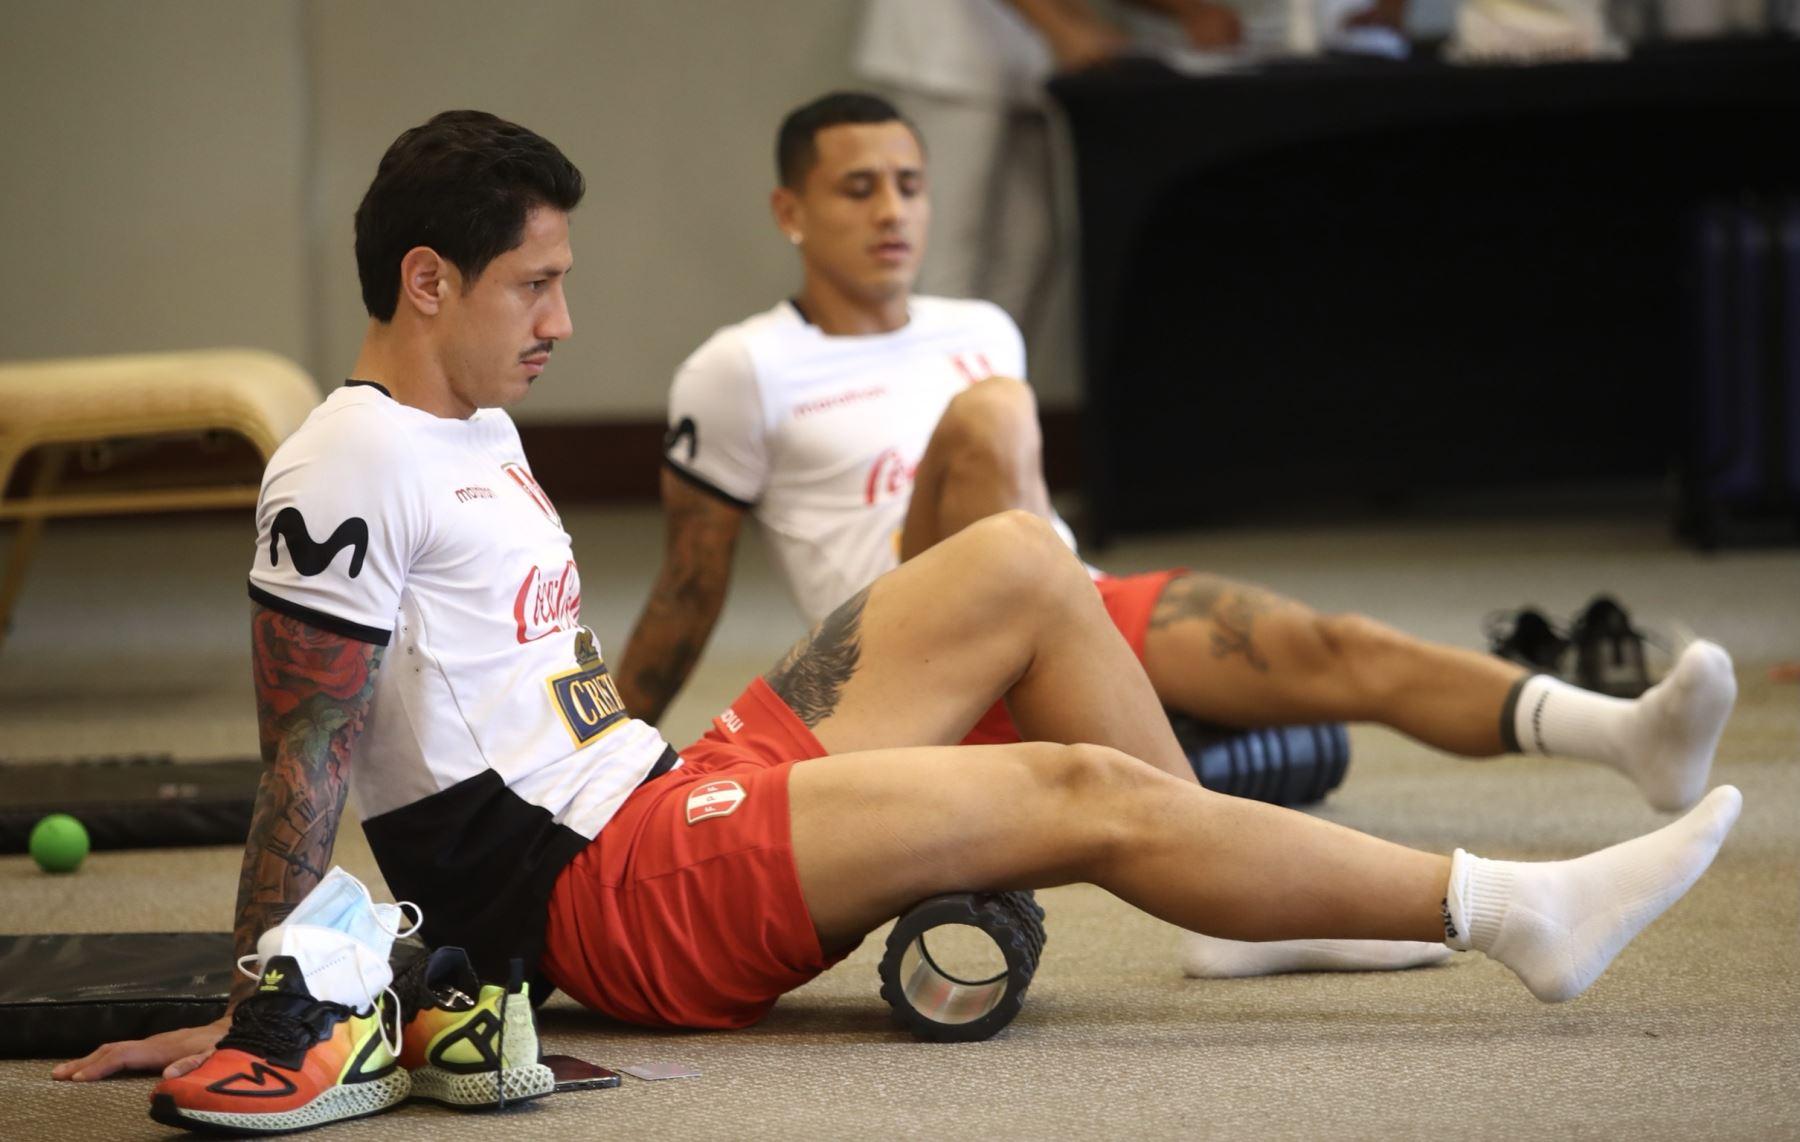 Selección peruana entrenó con miras a enfrentar a Colombia en la próxima fecha